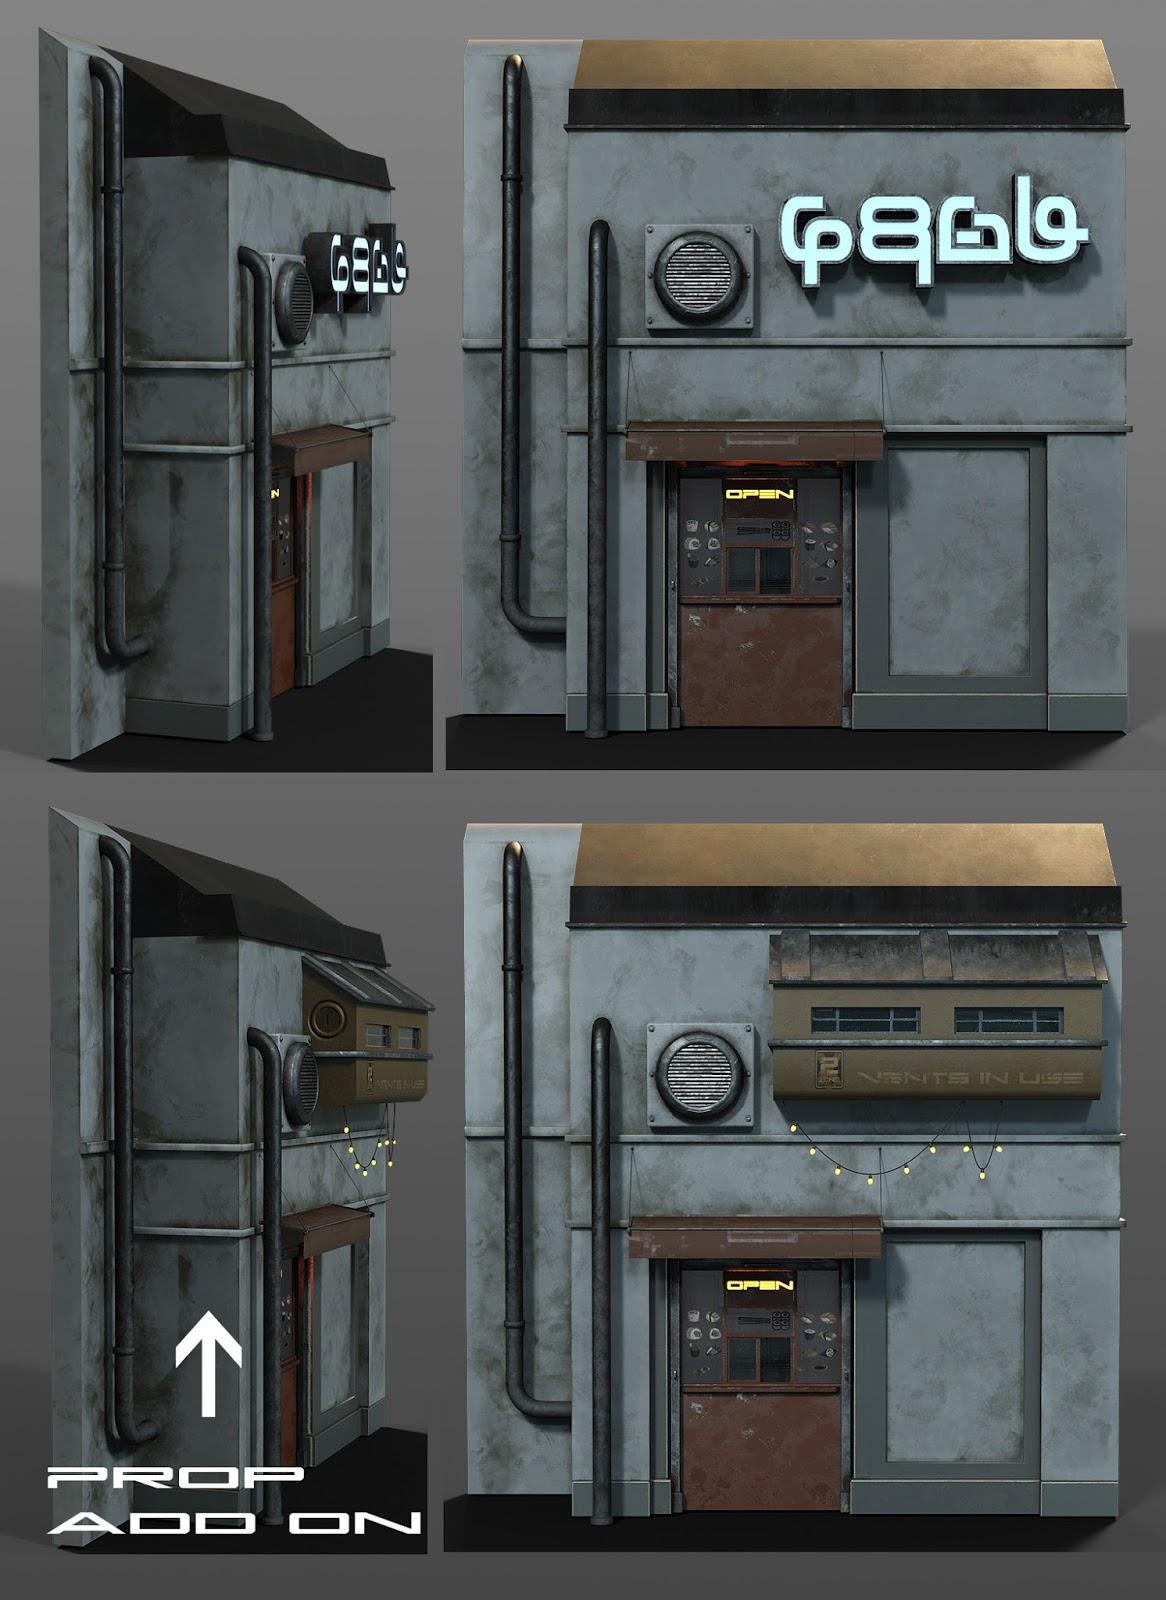 Download Daz Studio 3 For Free Daz 3d Sci Fi Black